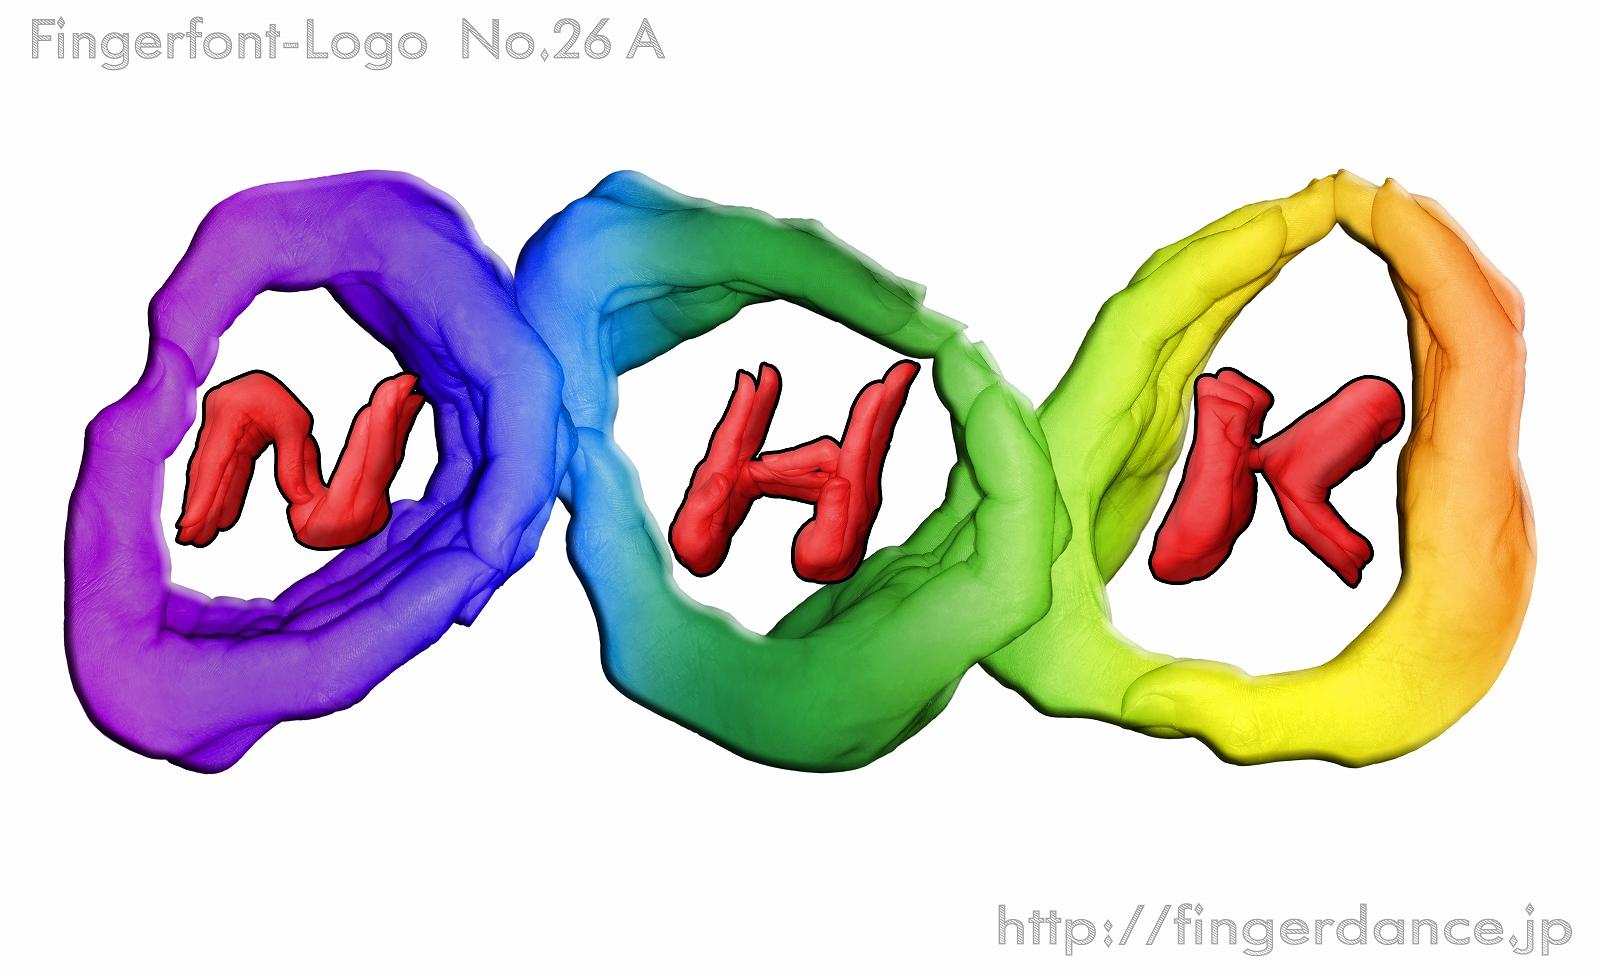 NHK-fingerhttp://fingerdance.jp/L/logohand 日本放送協会フィンガーロゴハンド手指